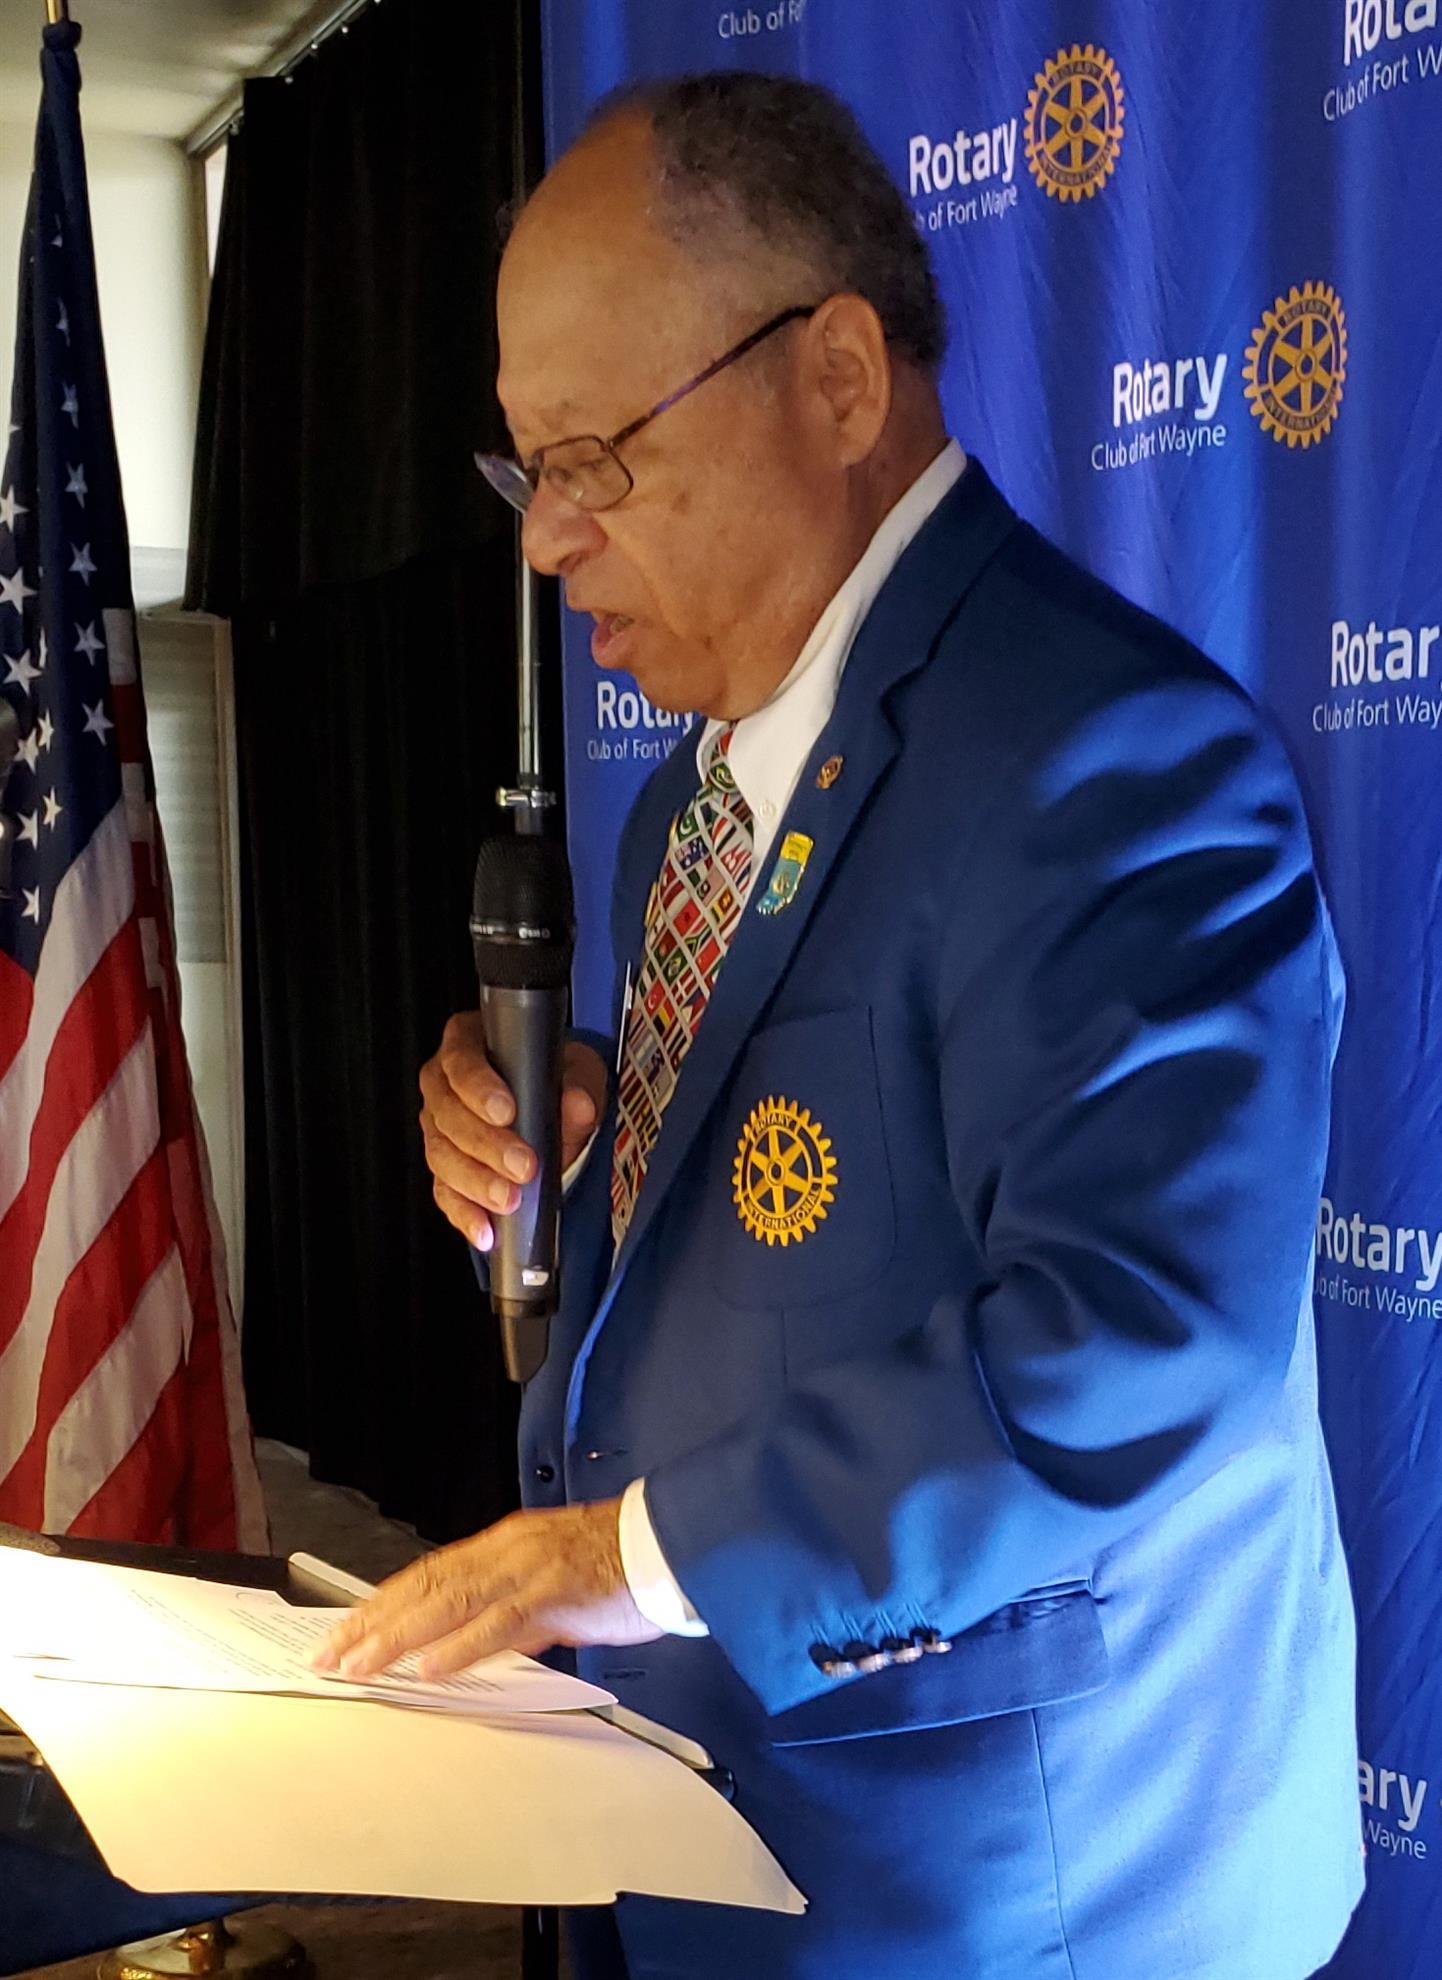 Stories | Rotary Club of Fort Wayne